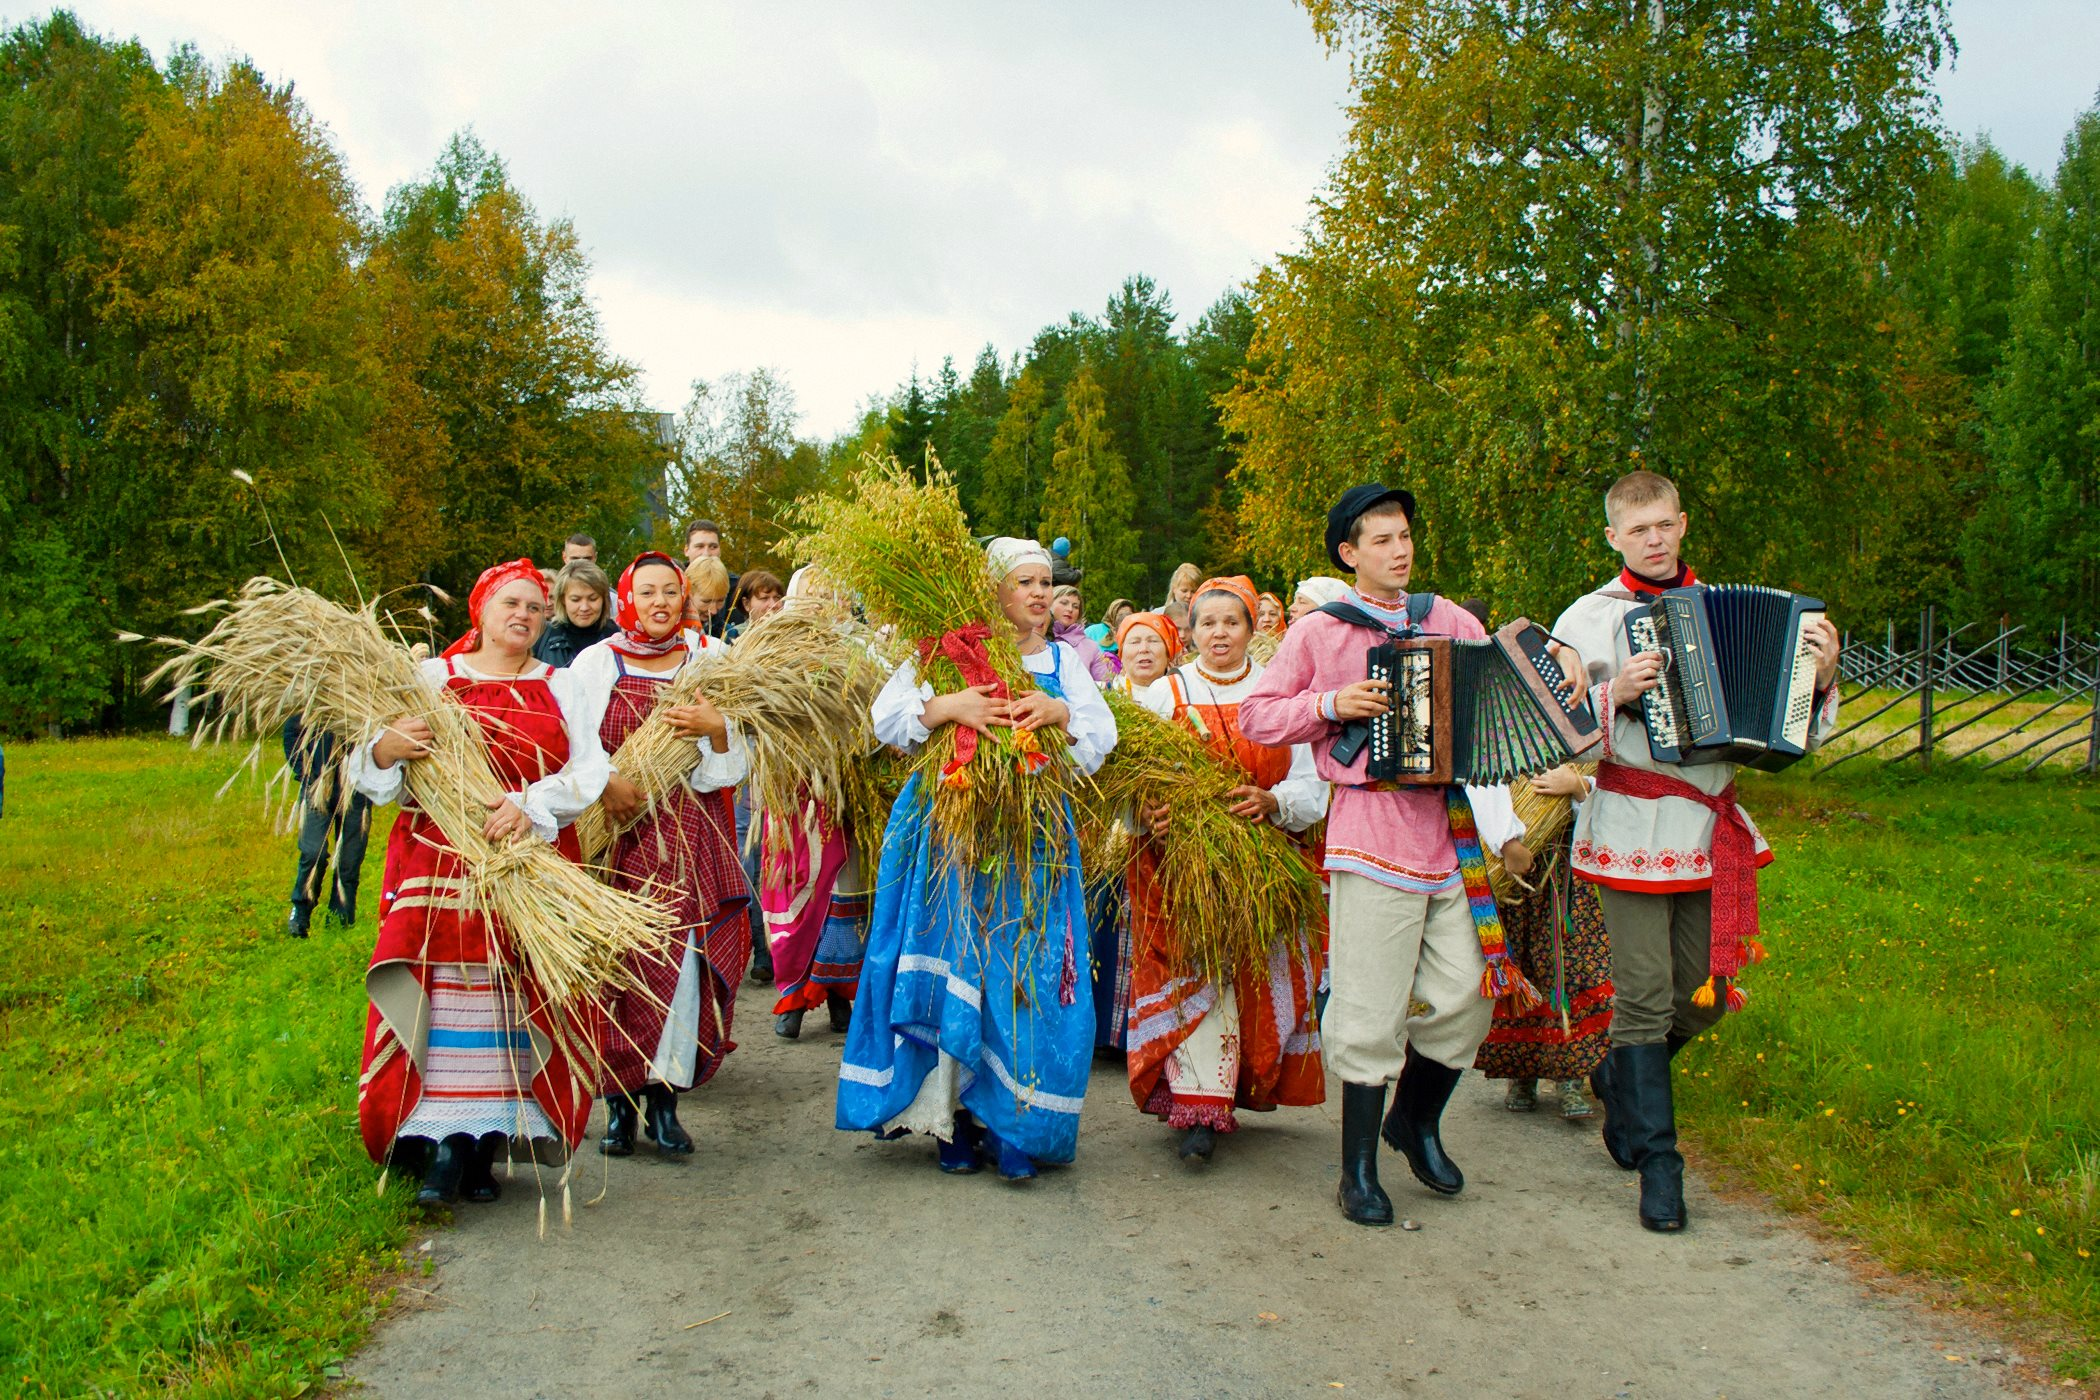 00 dozhinki belarus 261115